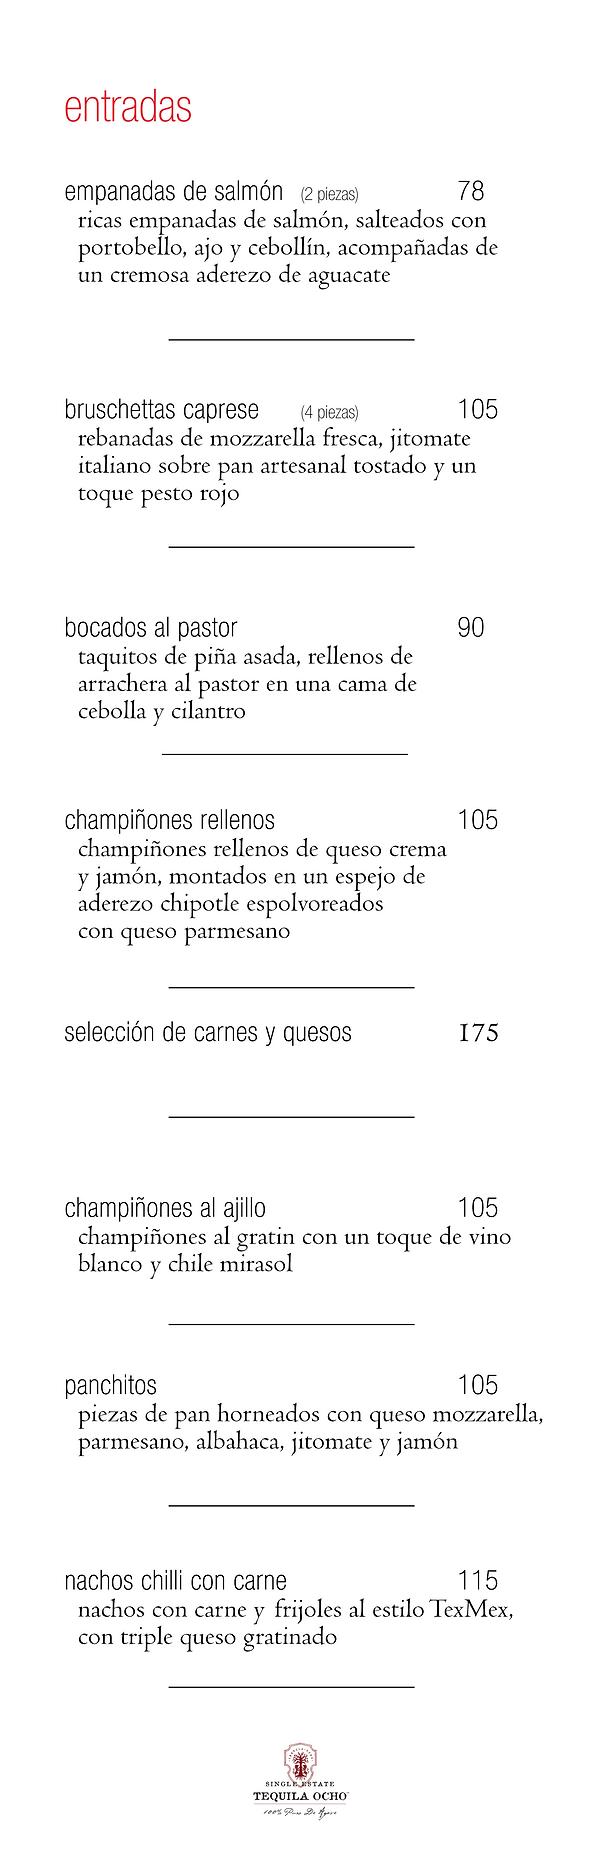 Page-2-entradas-pt1.jpg.png